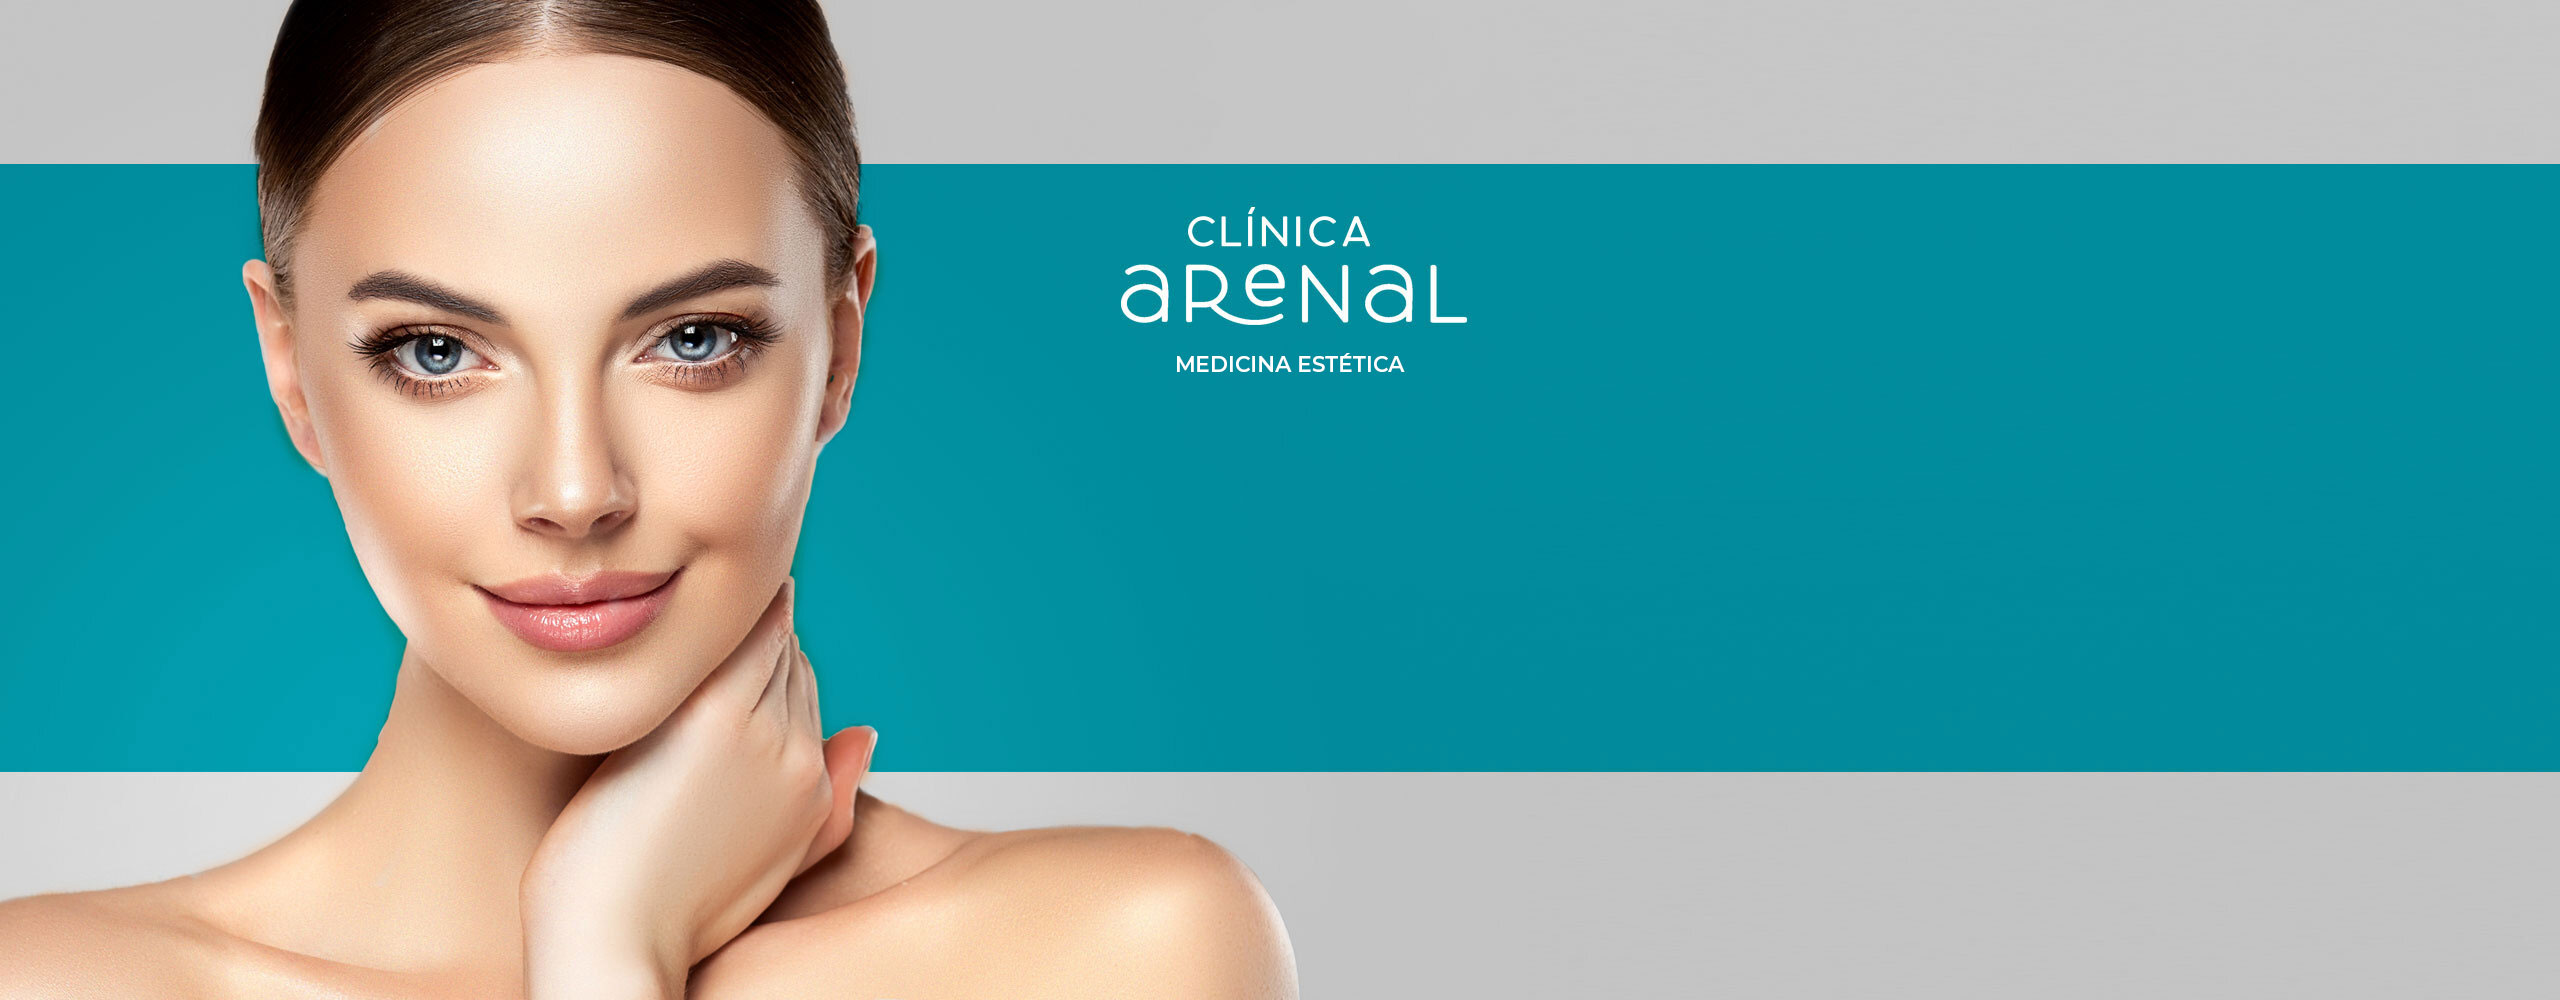 Medicina Estética - Clínica Arenal